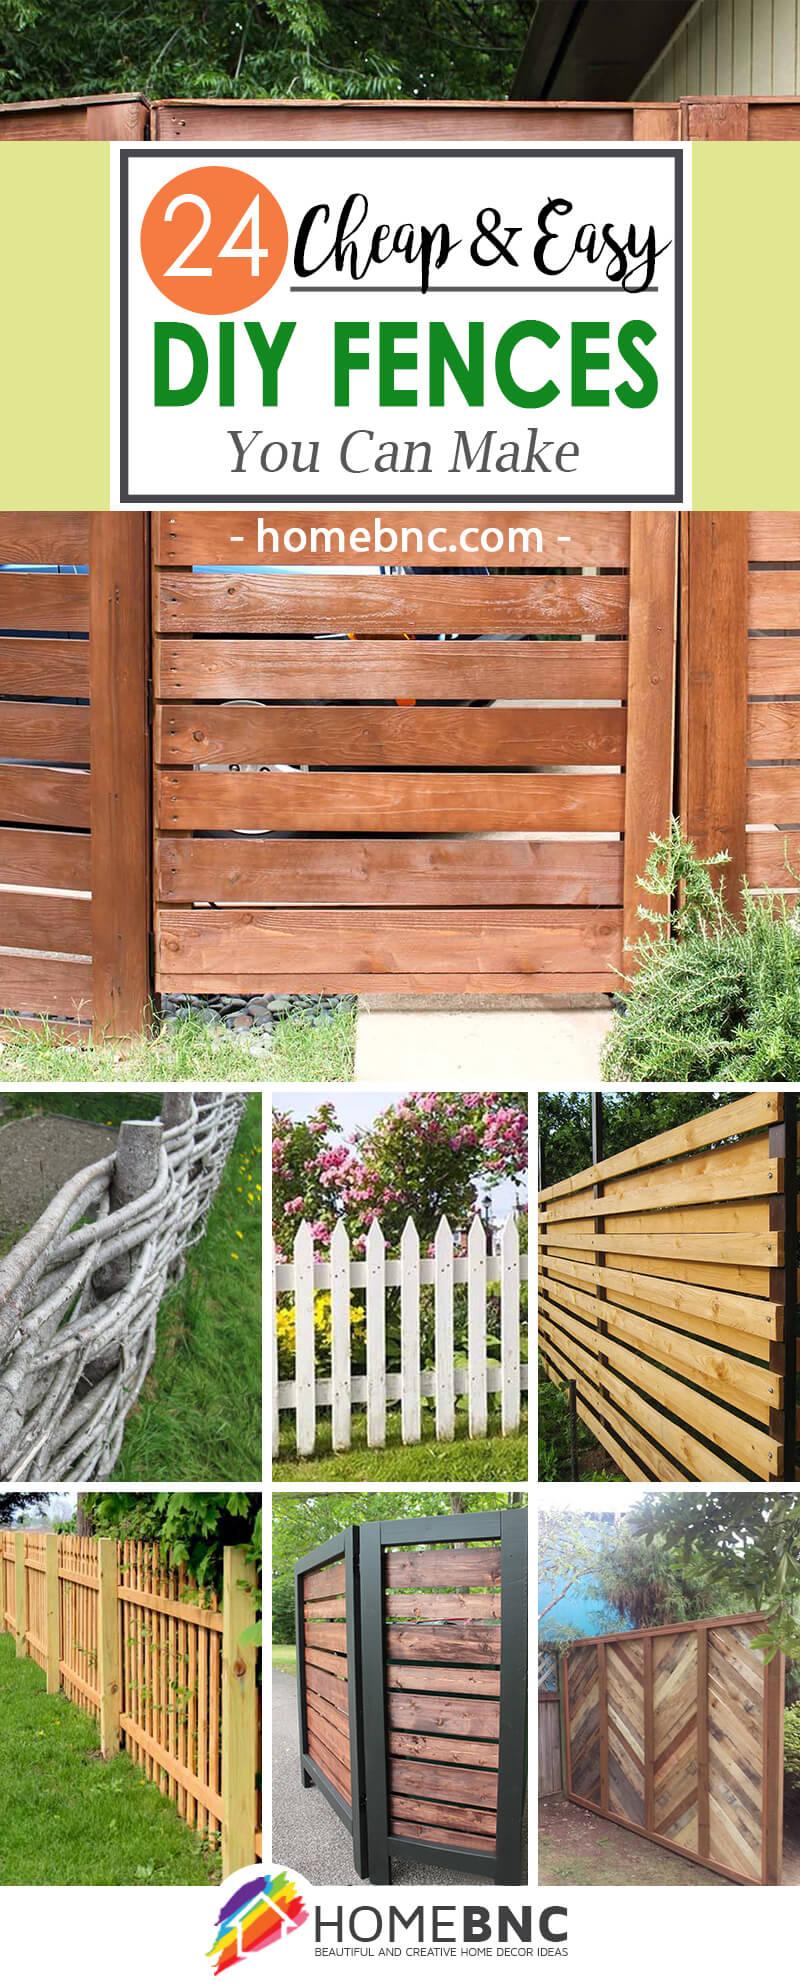 Fullsize Of Build Backyard Fence